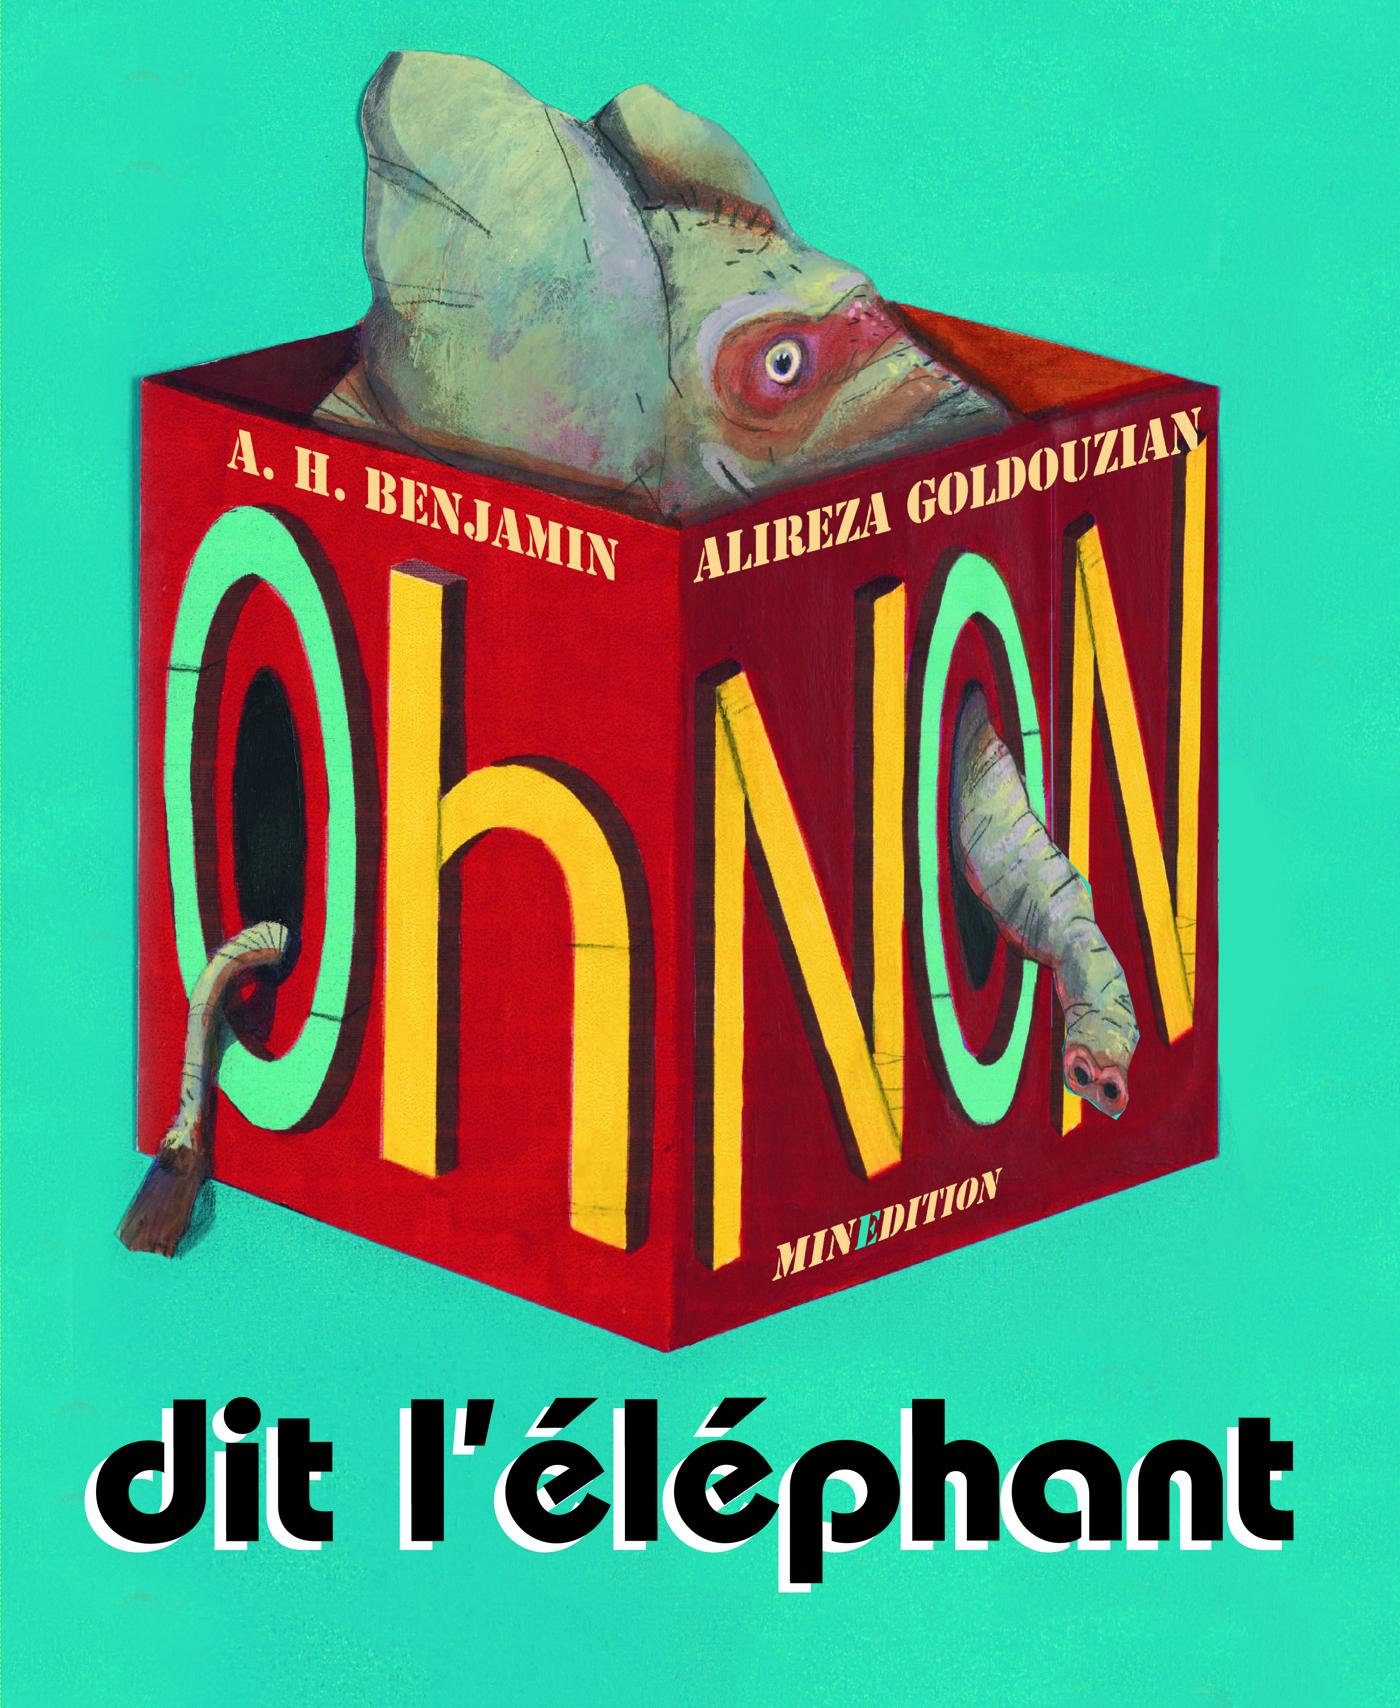 OH NON DIT L ELEPHANT